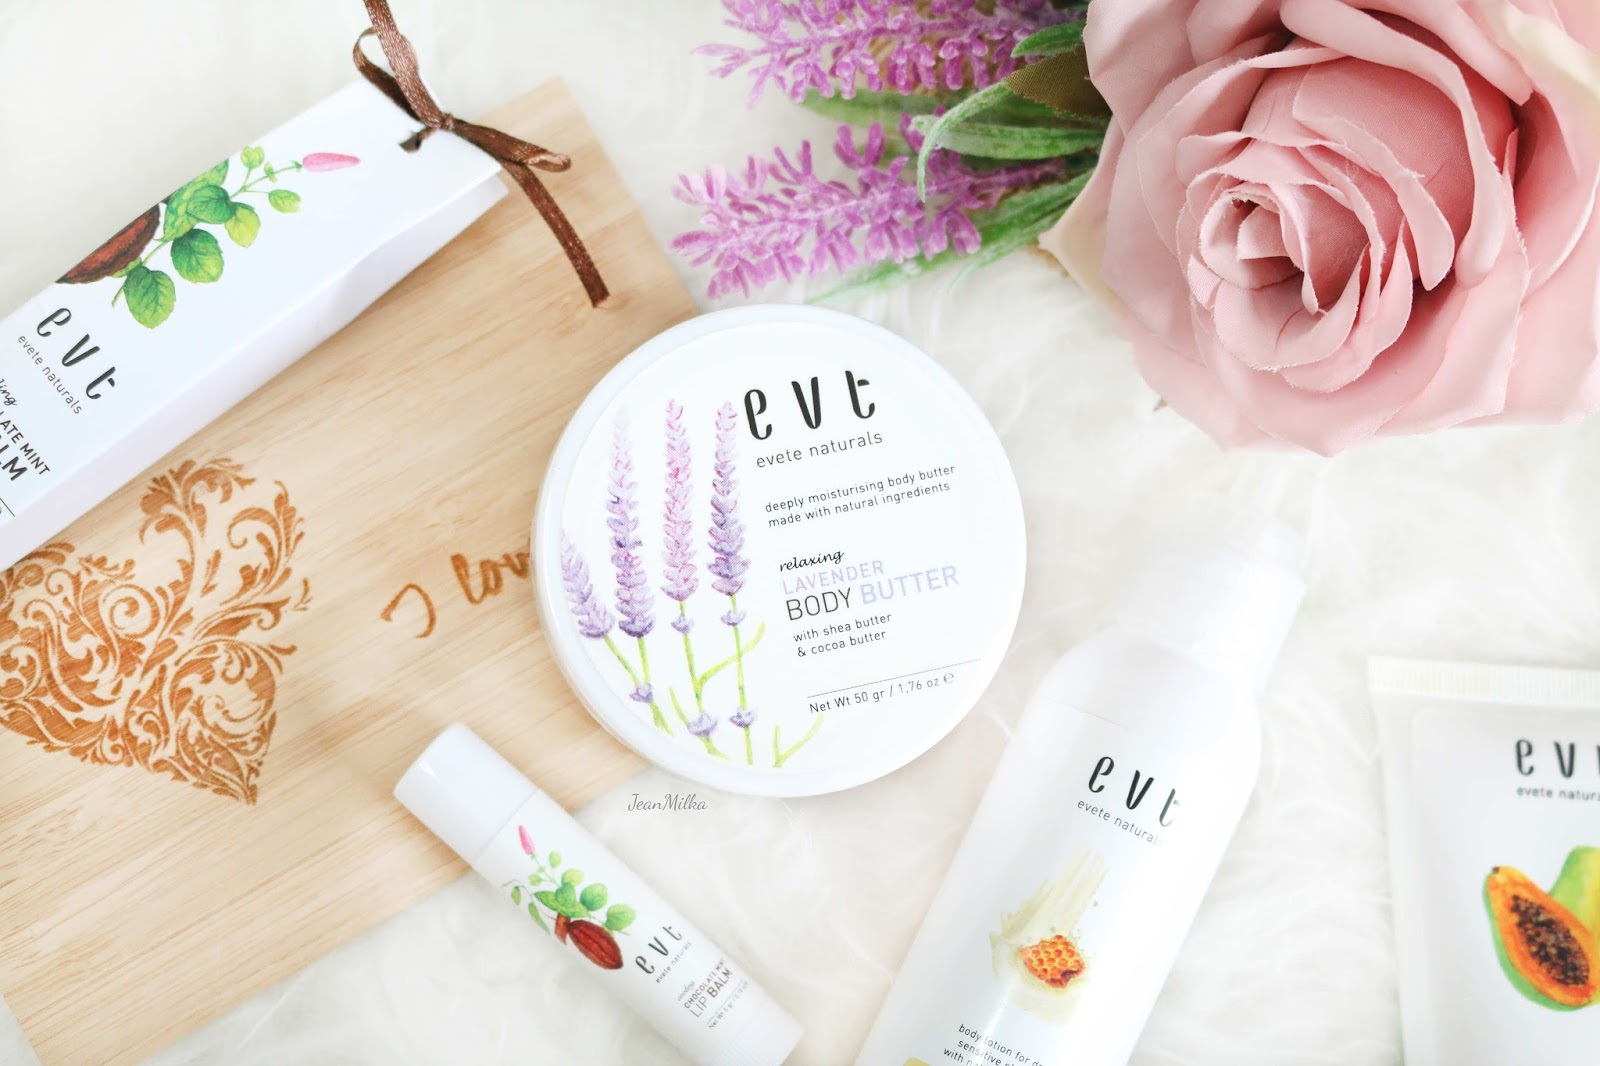 evete, evete naturals, skincare, body lotion, body butter, review evete, produk indonesia, body care, evt, review evete naturals